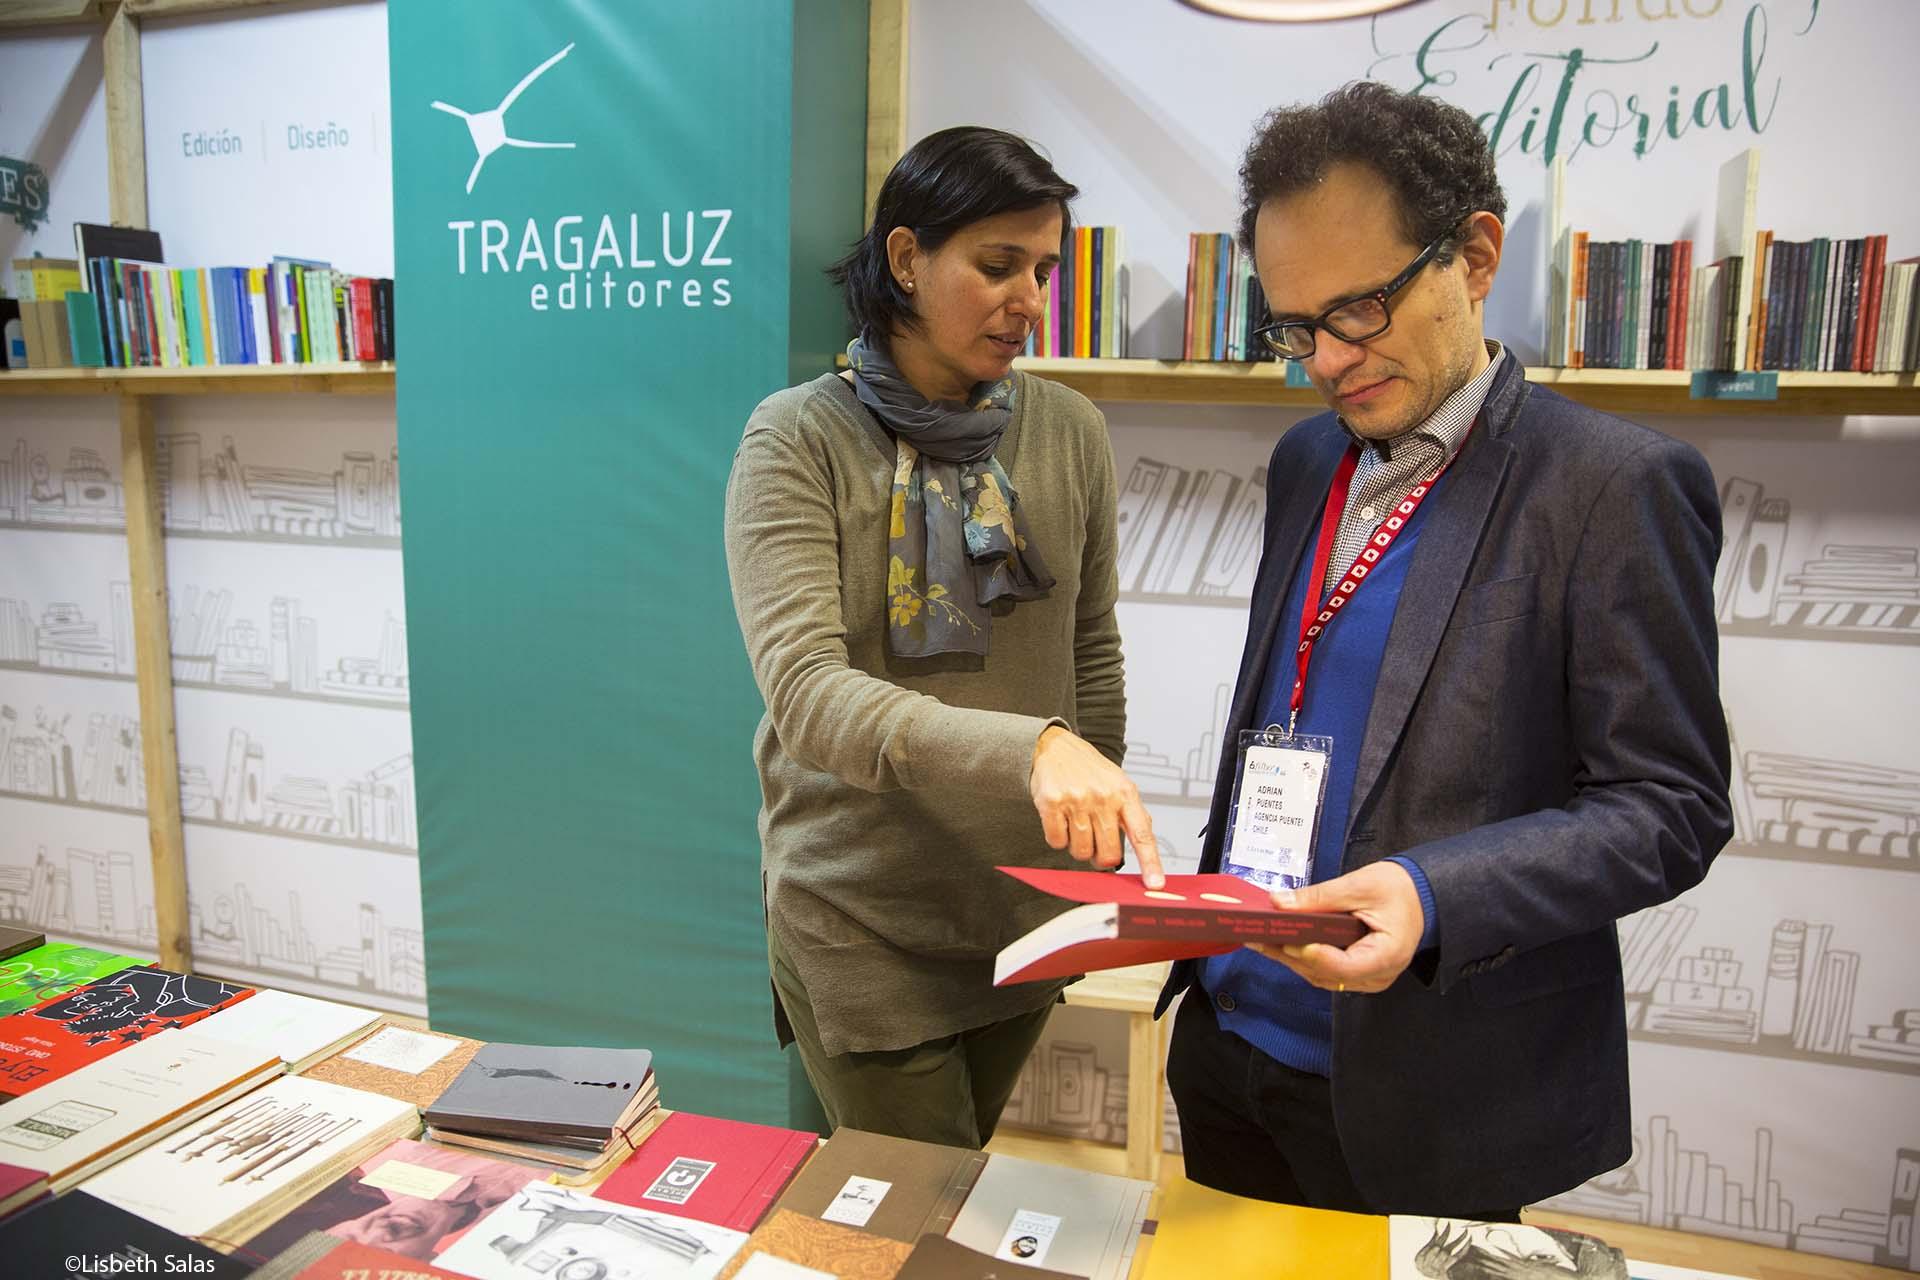 Pilar Gutiérrez, editora de Tragaluz, en la FILBo 2017.